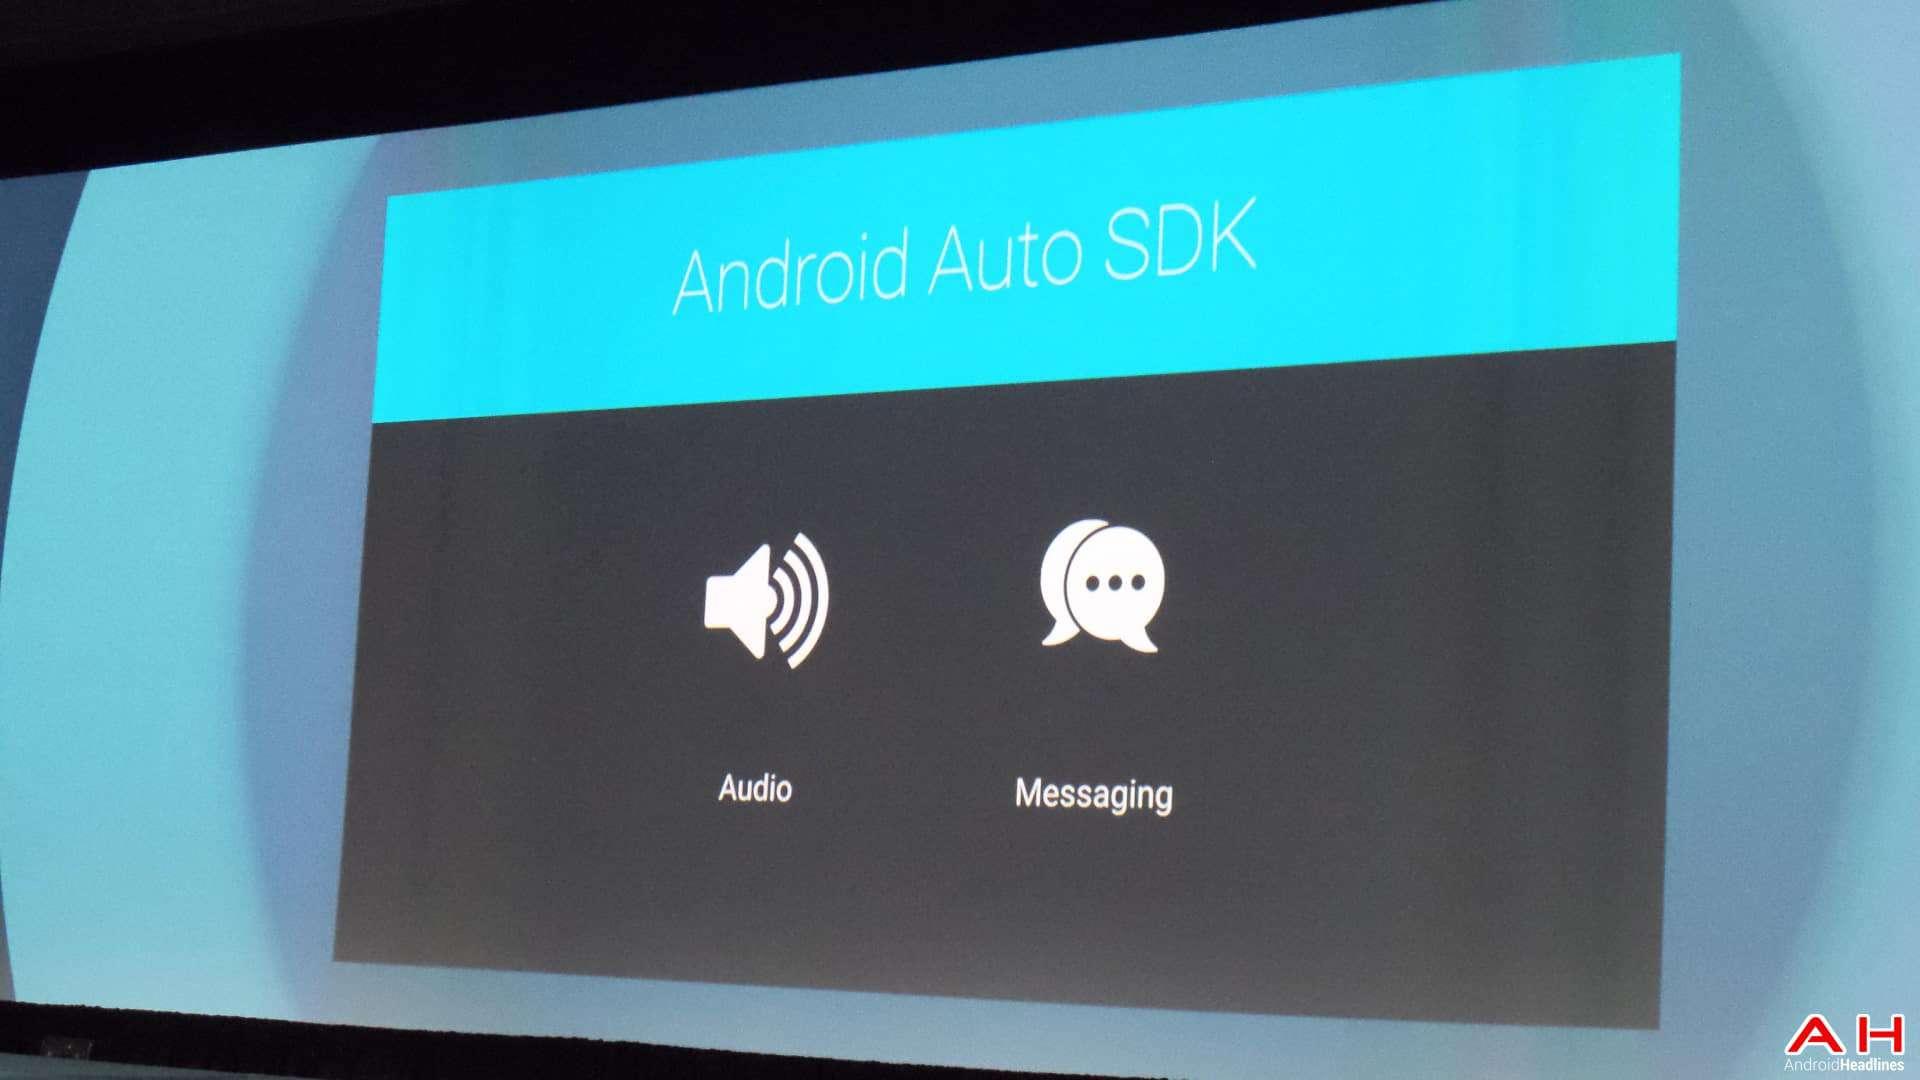 AH Google IO 2014 404 of 9 Auto SDK